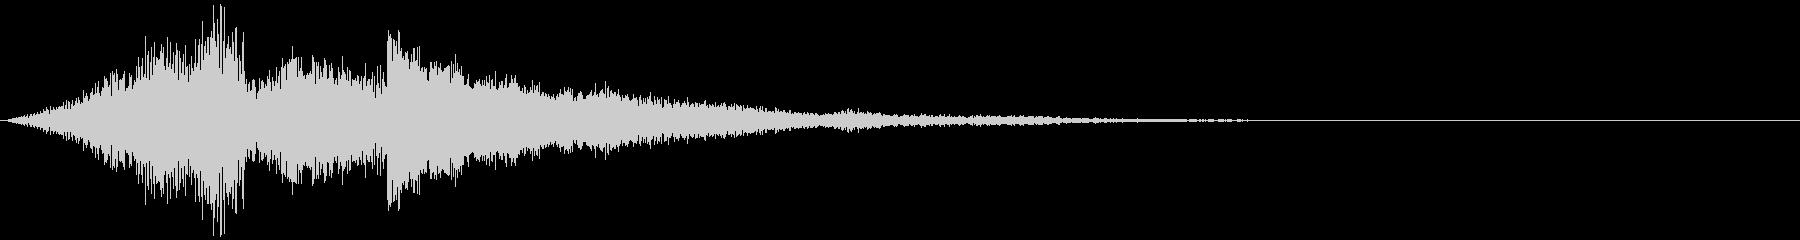 Brun Lul Lulun Picarn (Topics)'s unreproduced waveform